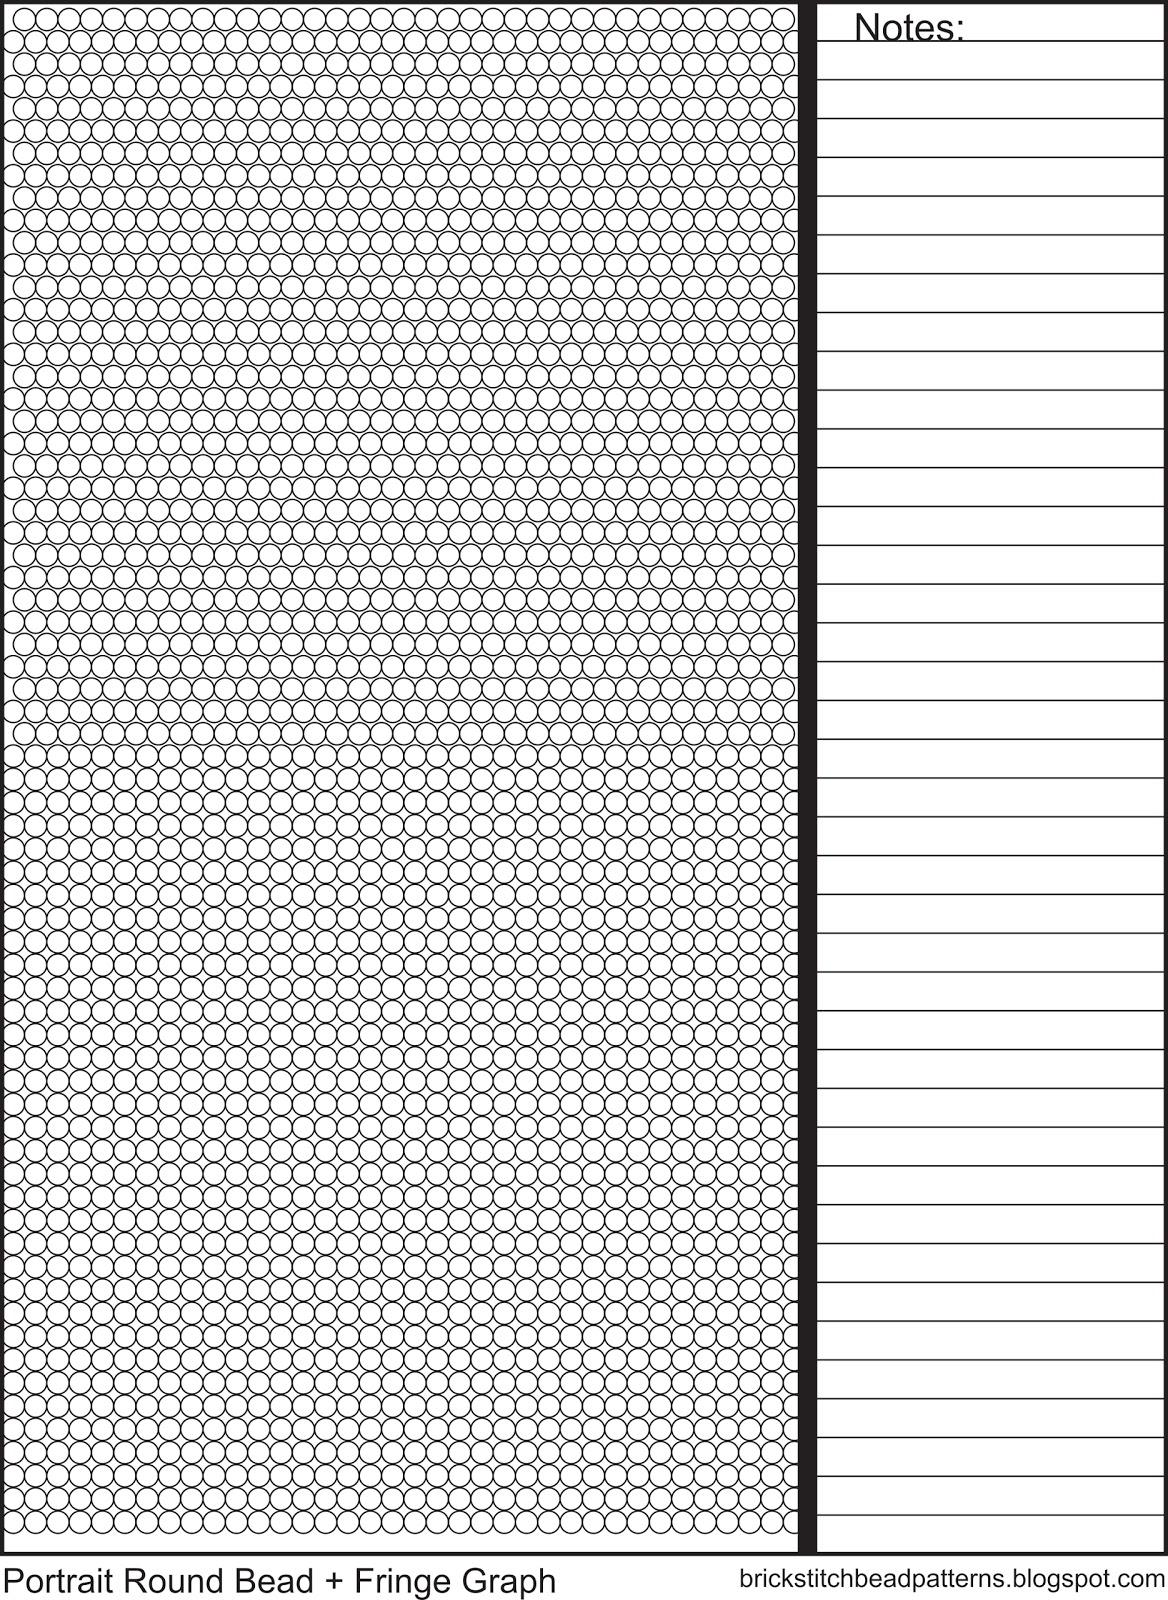 Printable Brick Stitch With Fringe Graph Paper